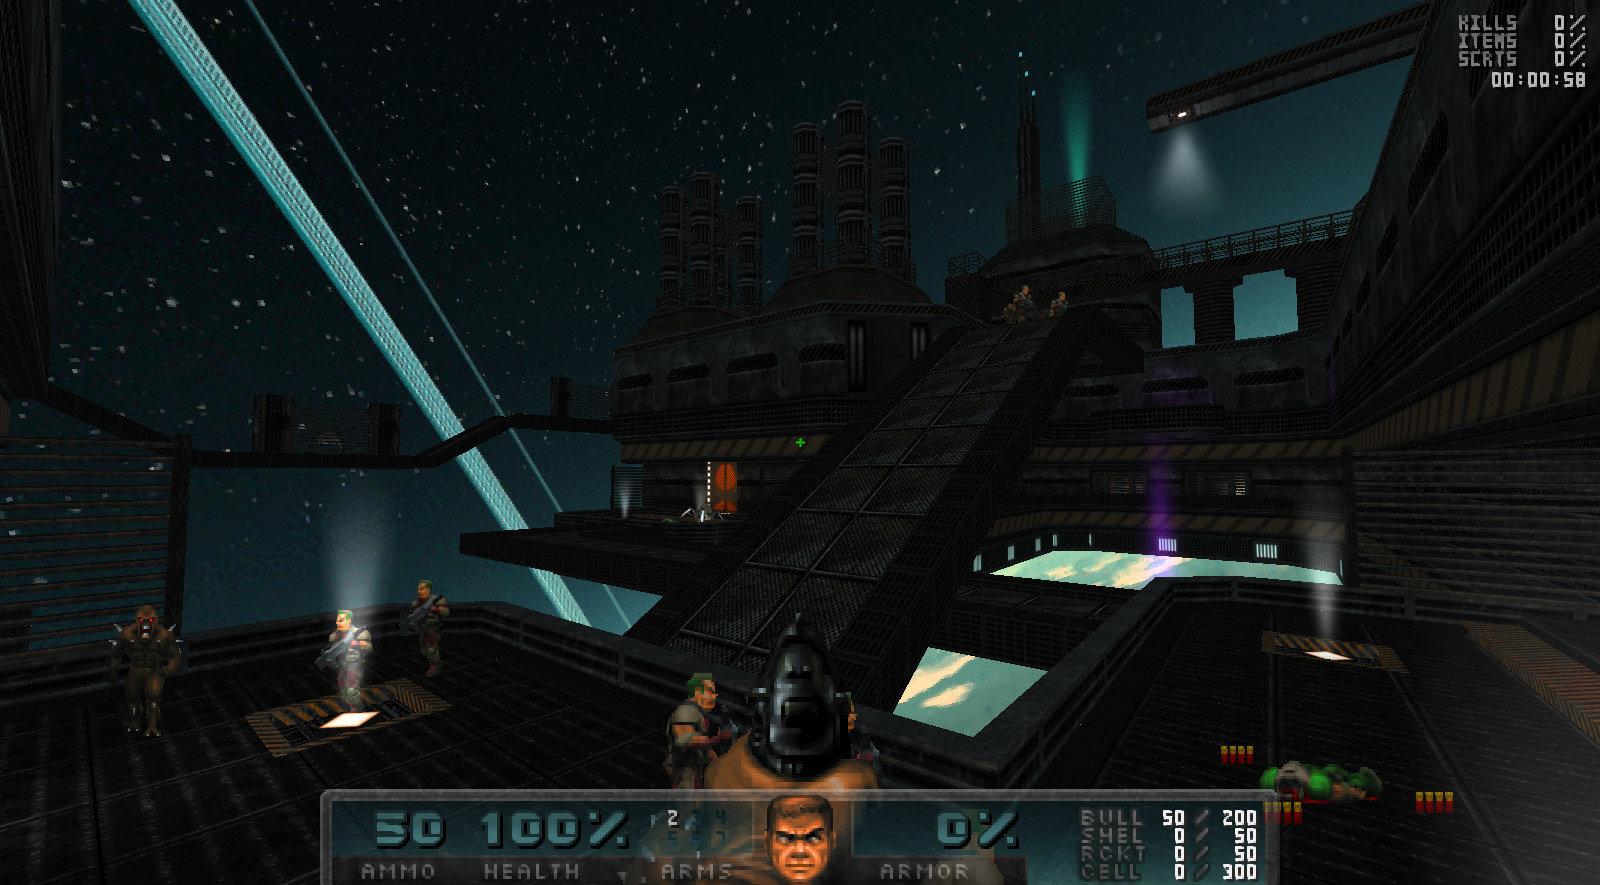 Screenshot_Doom_20200522_100645.jpg.0497c744daff967a147714bd7fe0acb2.jpg